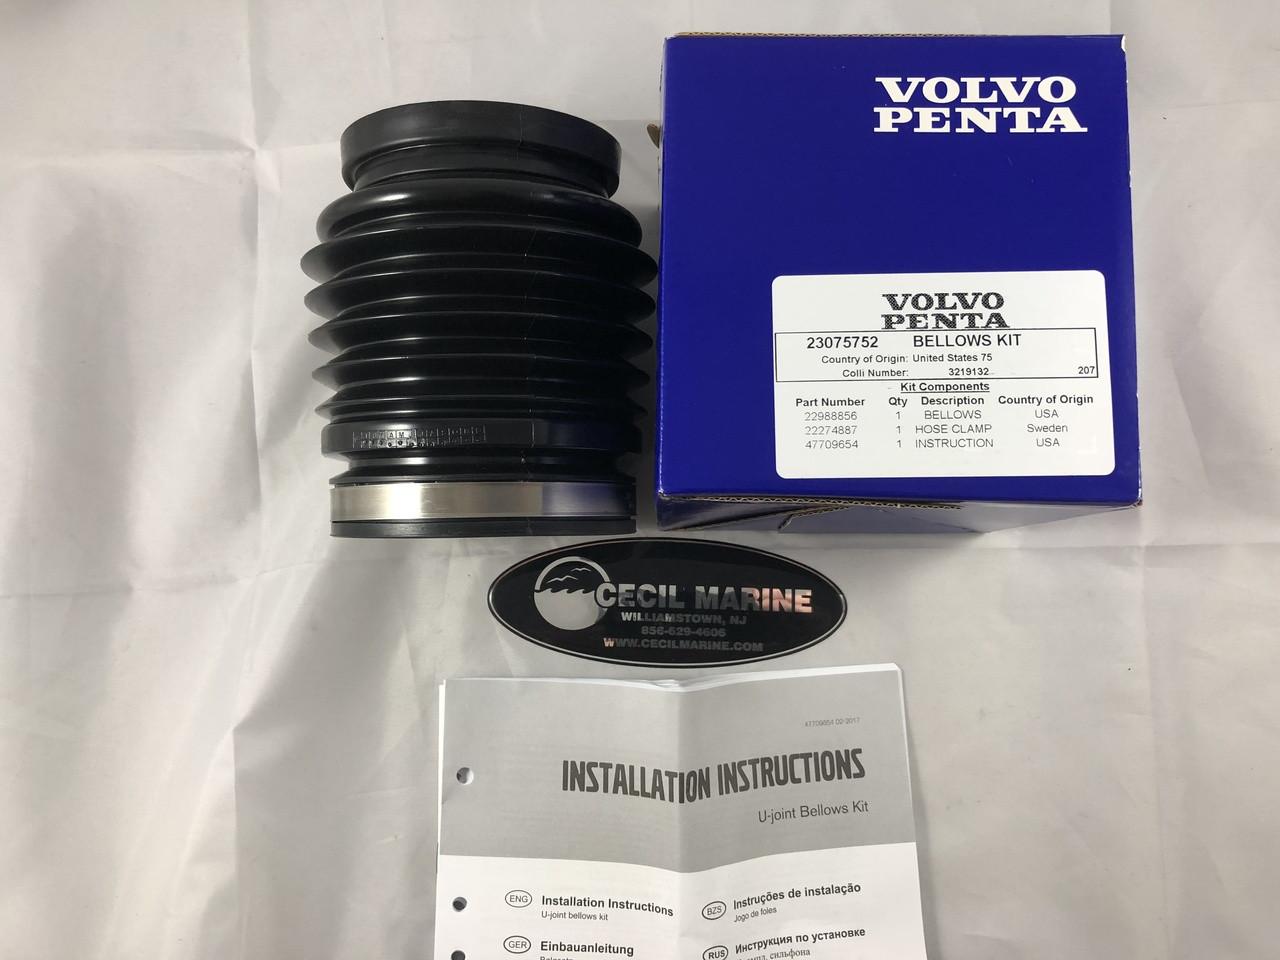 $60.07* GENUINE VOLVO U-JOINT BELLOWS KIT GENUINE VOLVO - 23075752 **In stock & ready to ship!